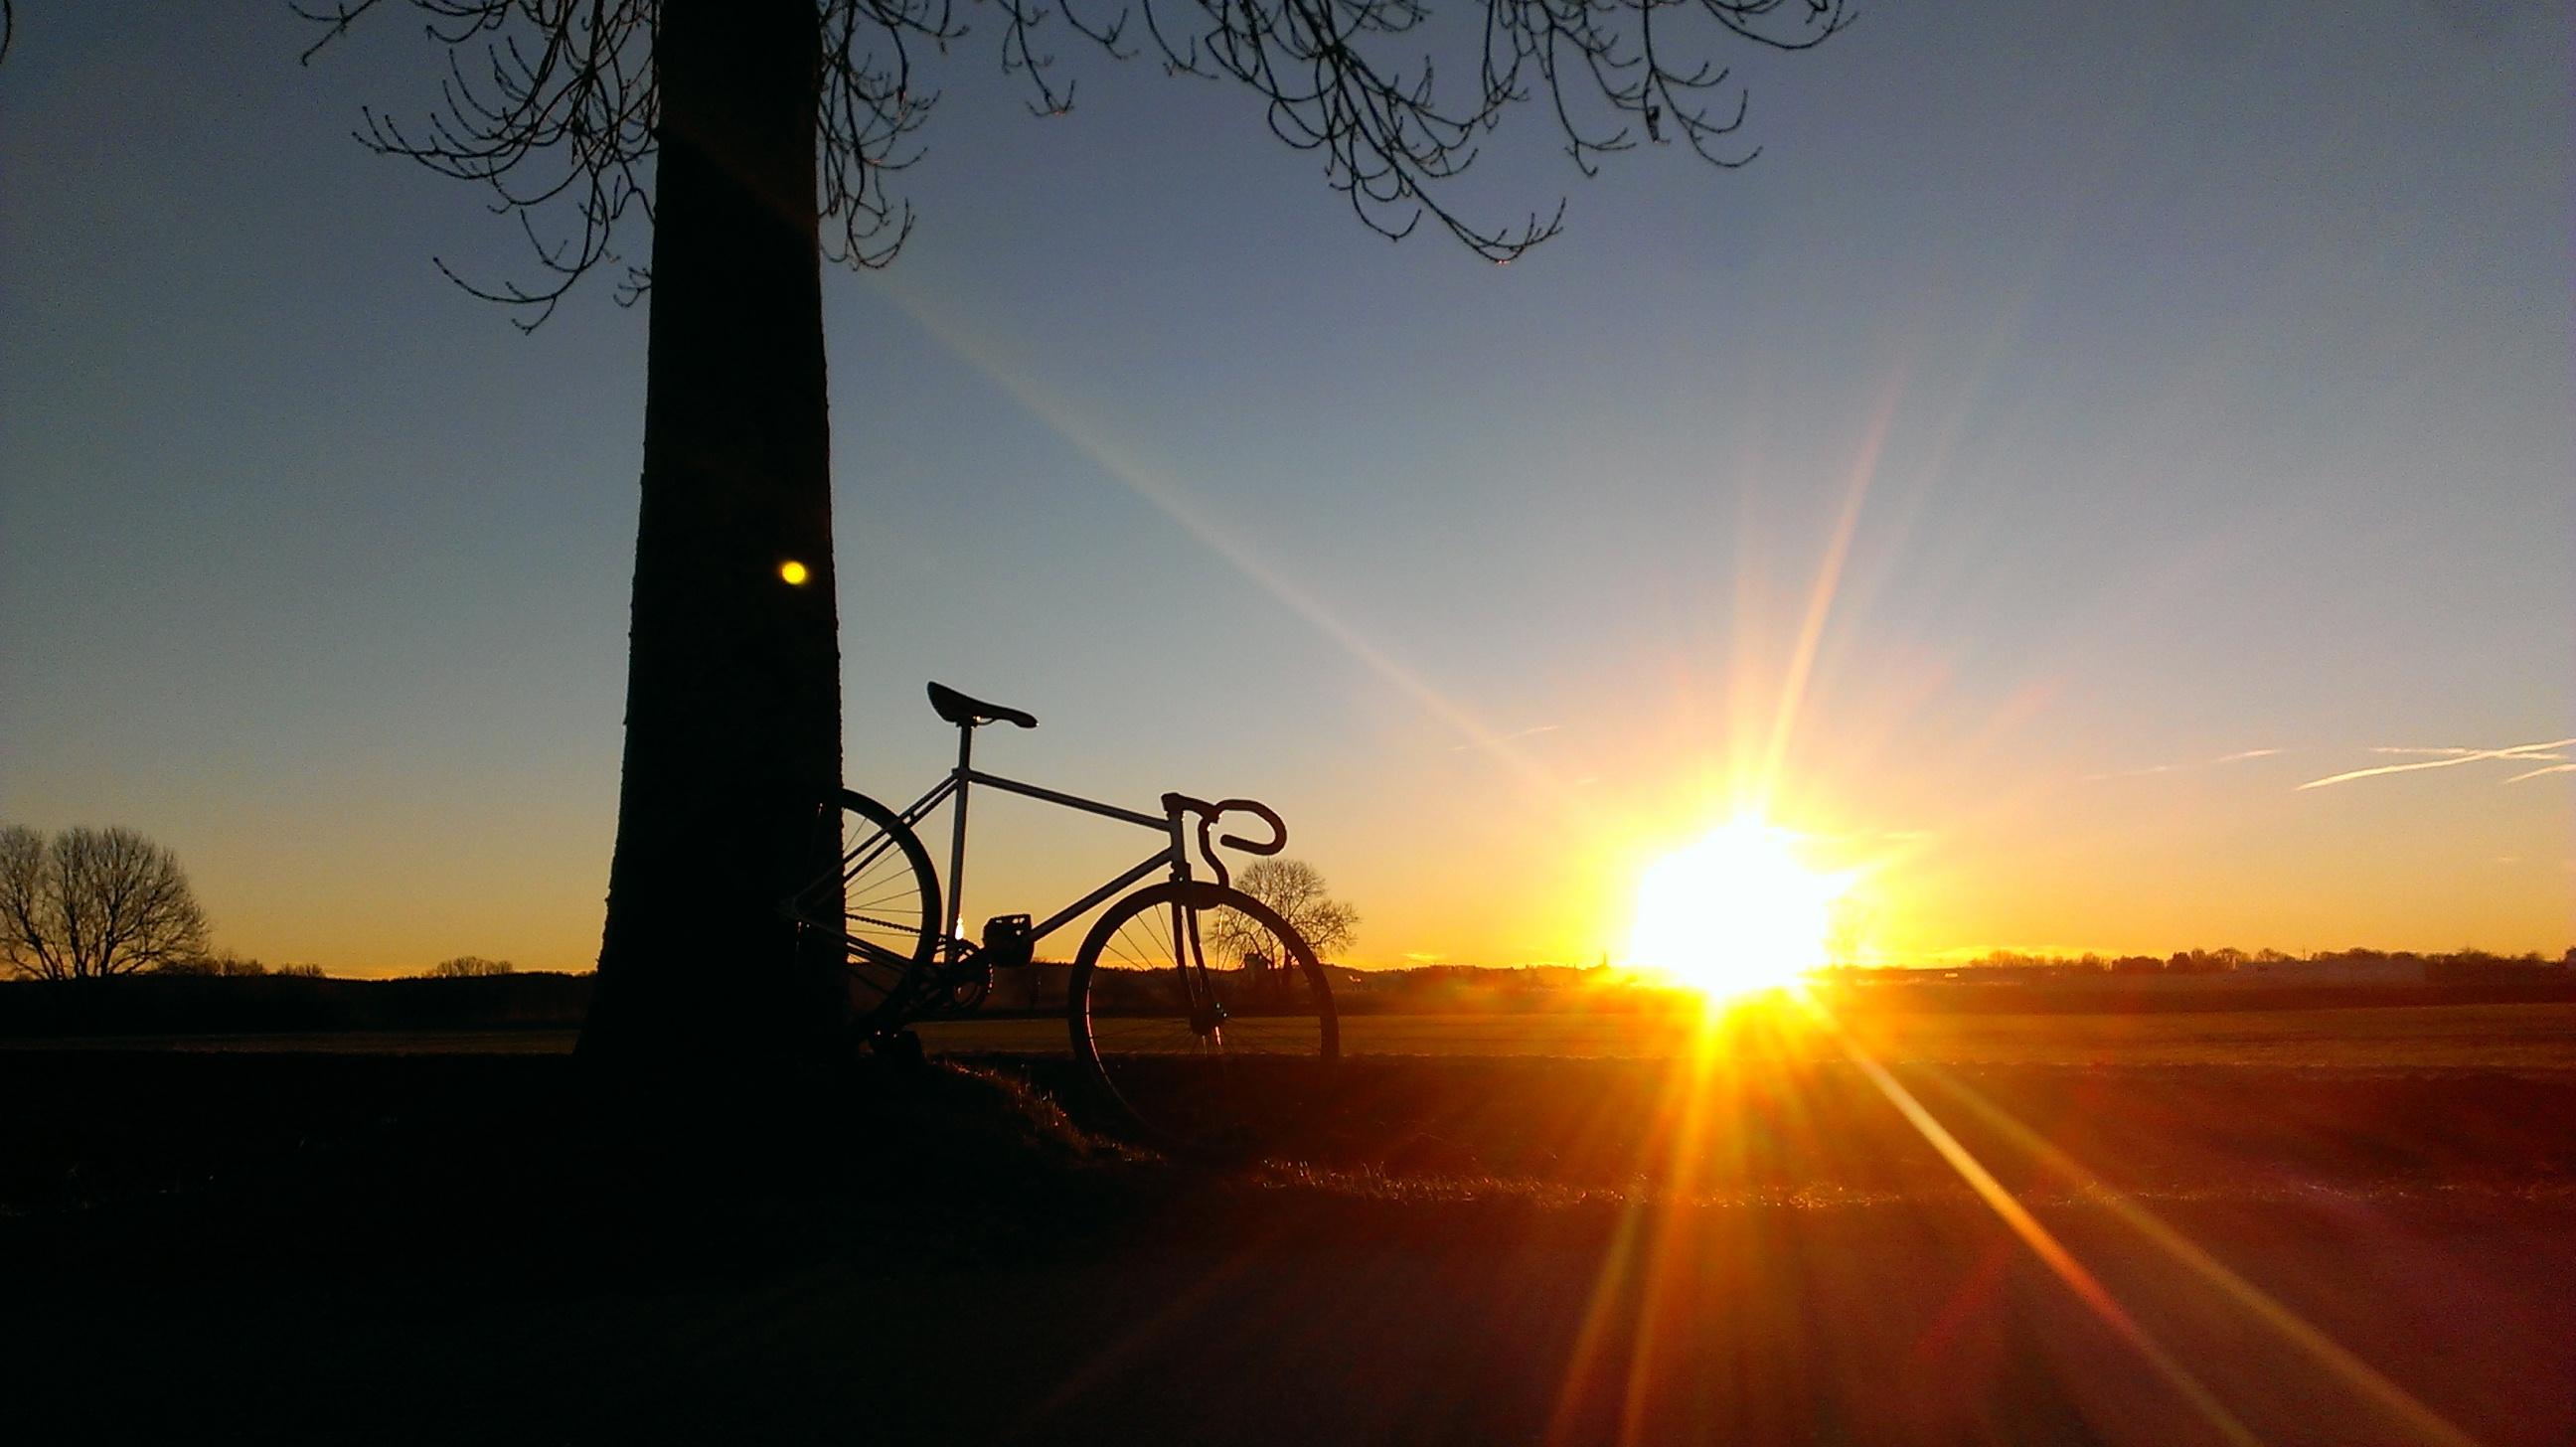 sunny morging ride to work